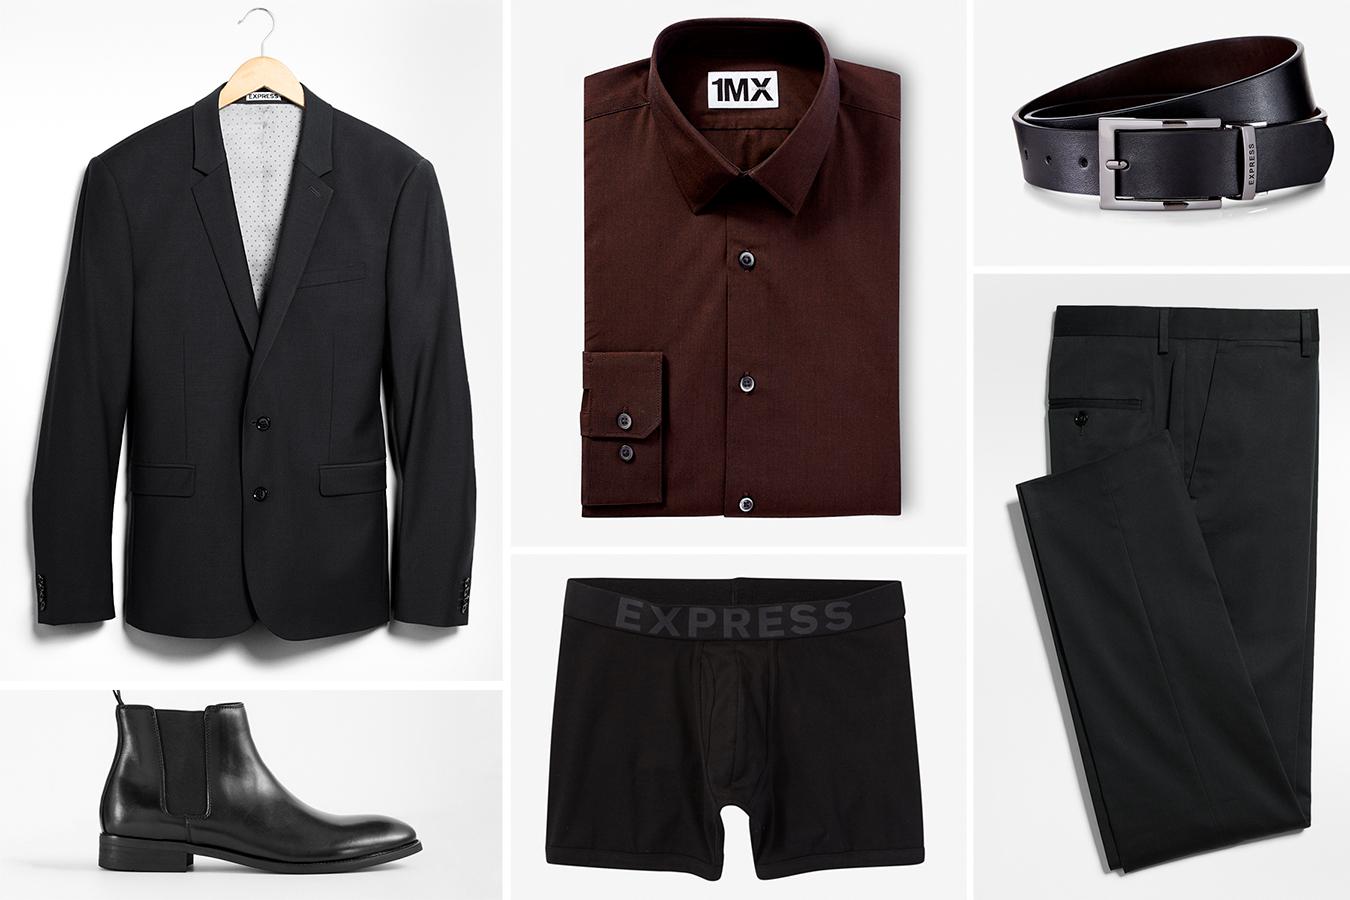 slim-black-wool-mens-suit-mens-boots-dress-shirt-leather-belt